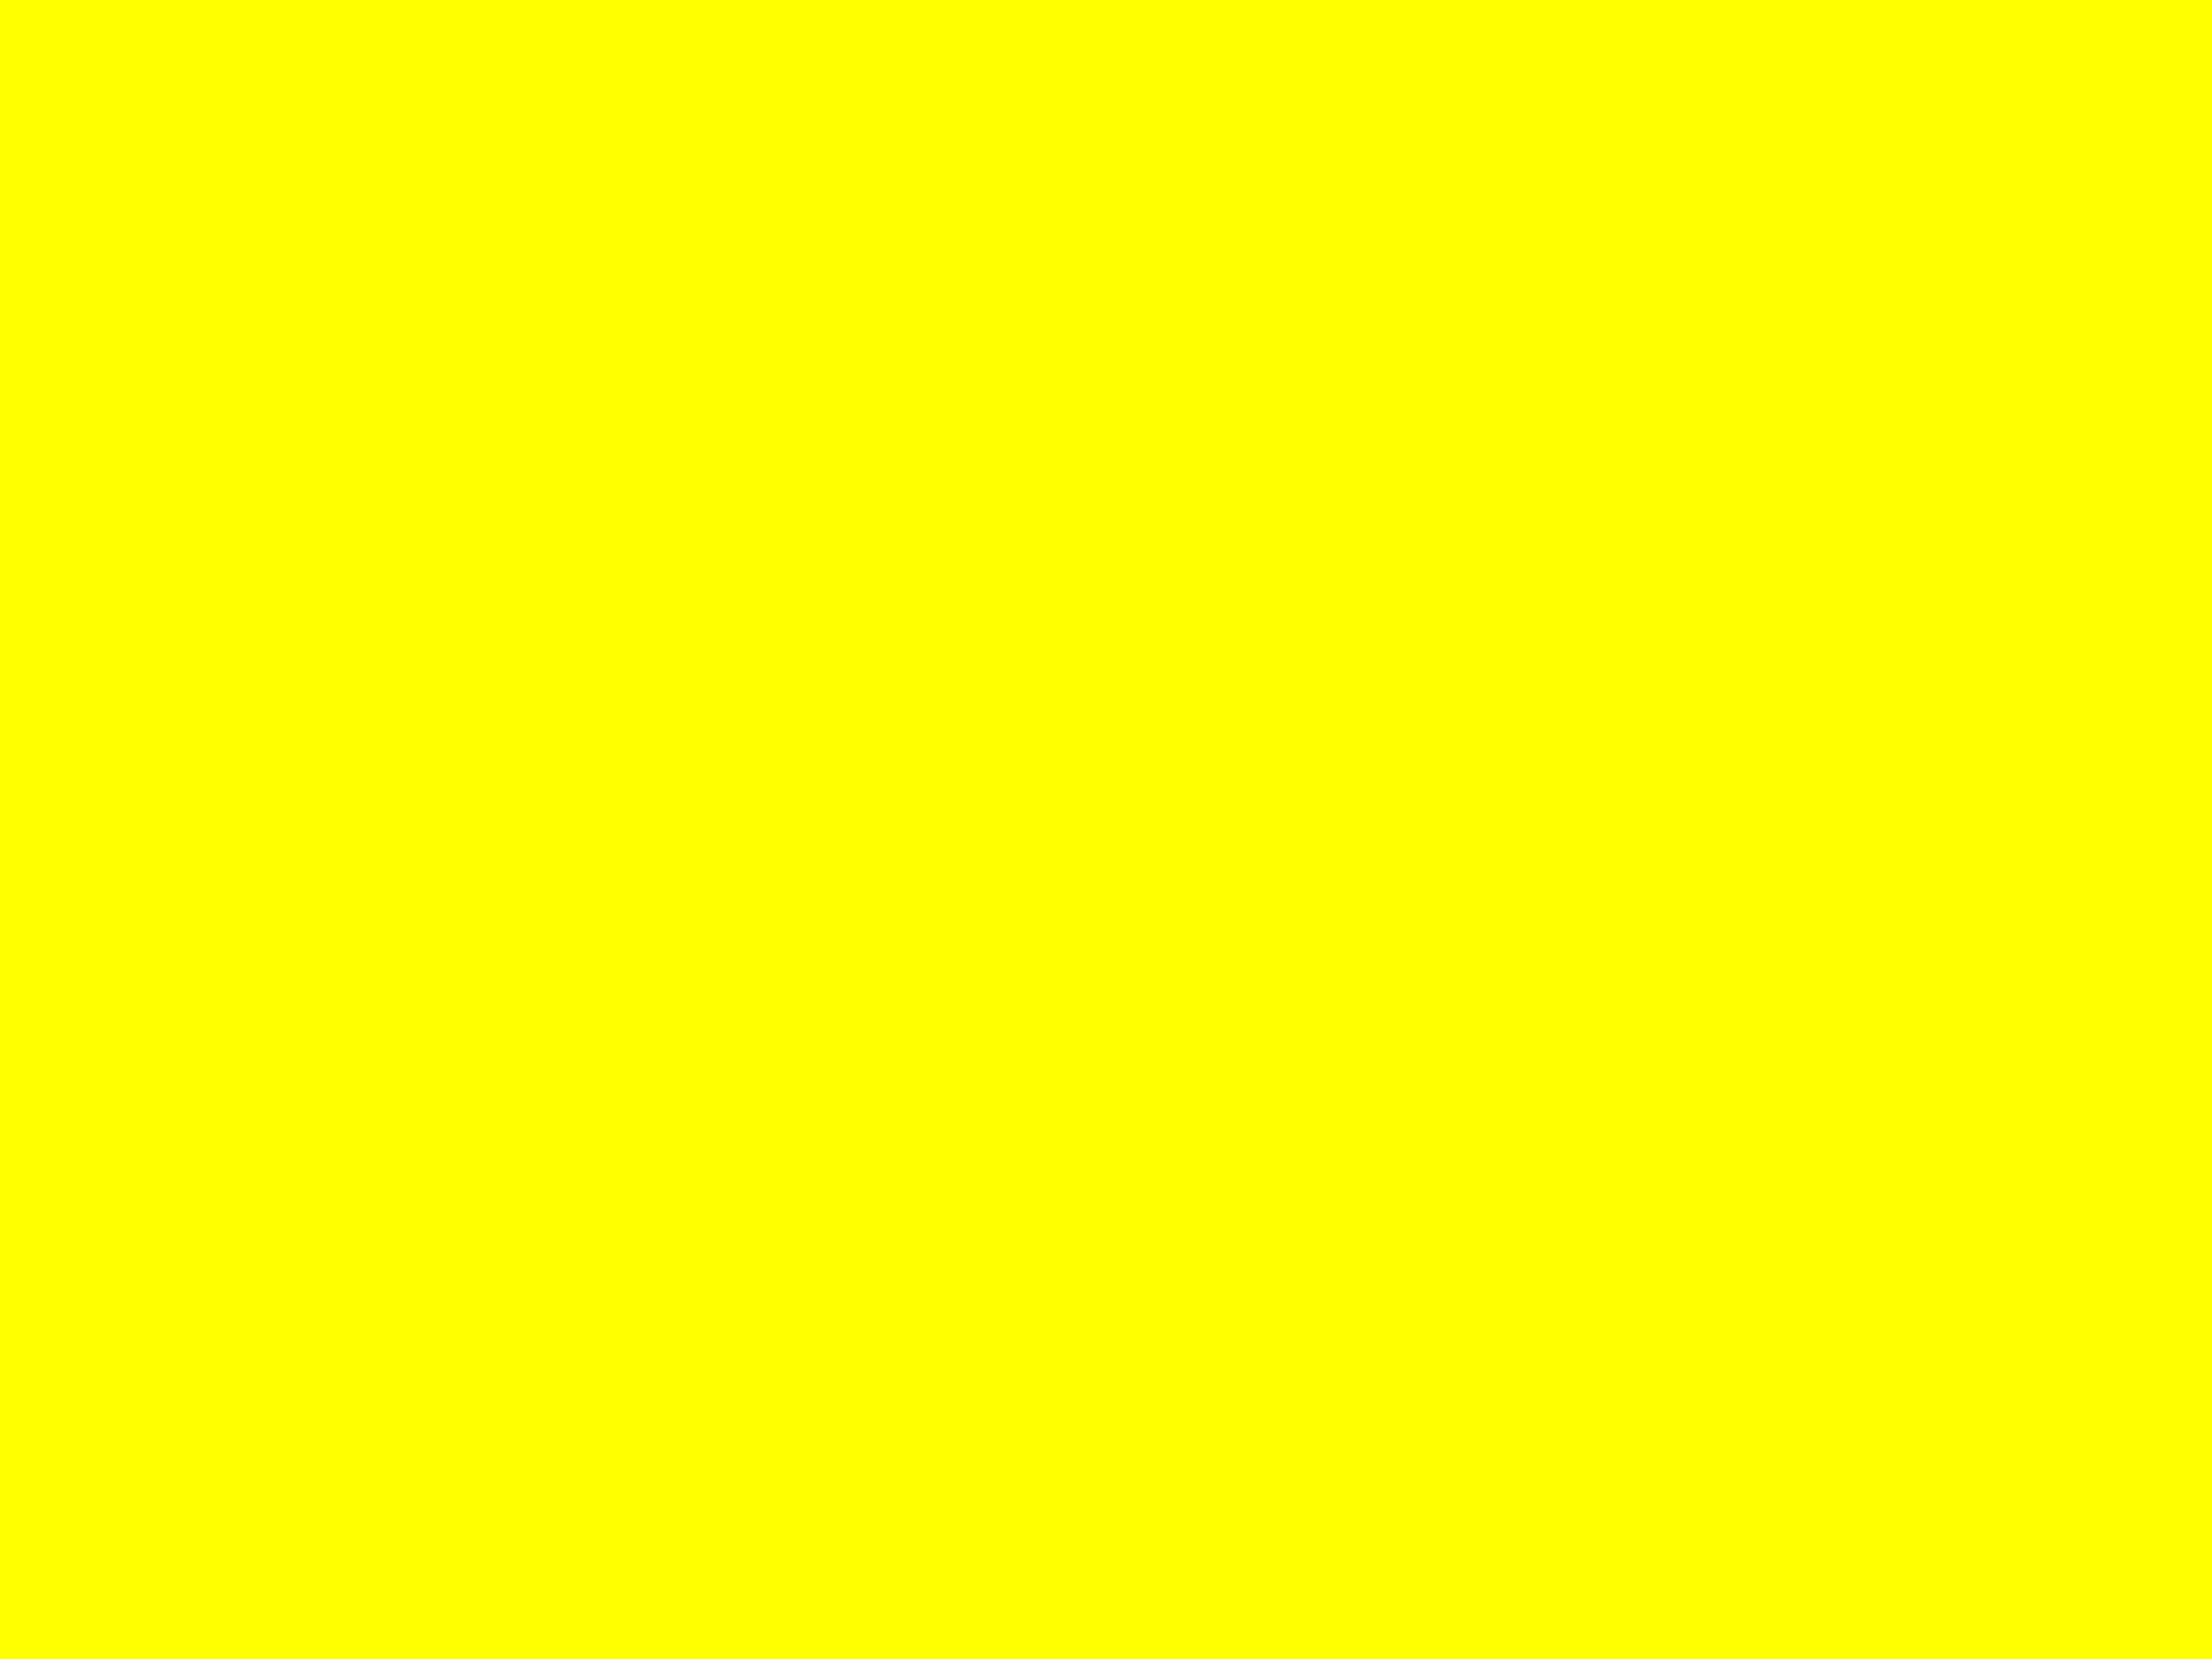 Gelbes Bild